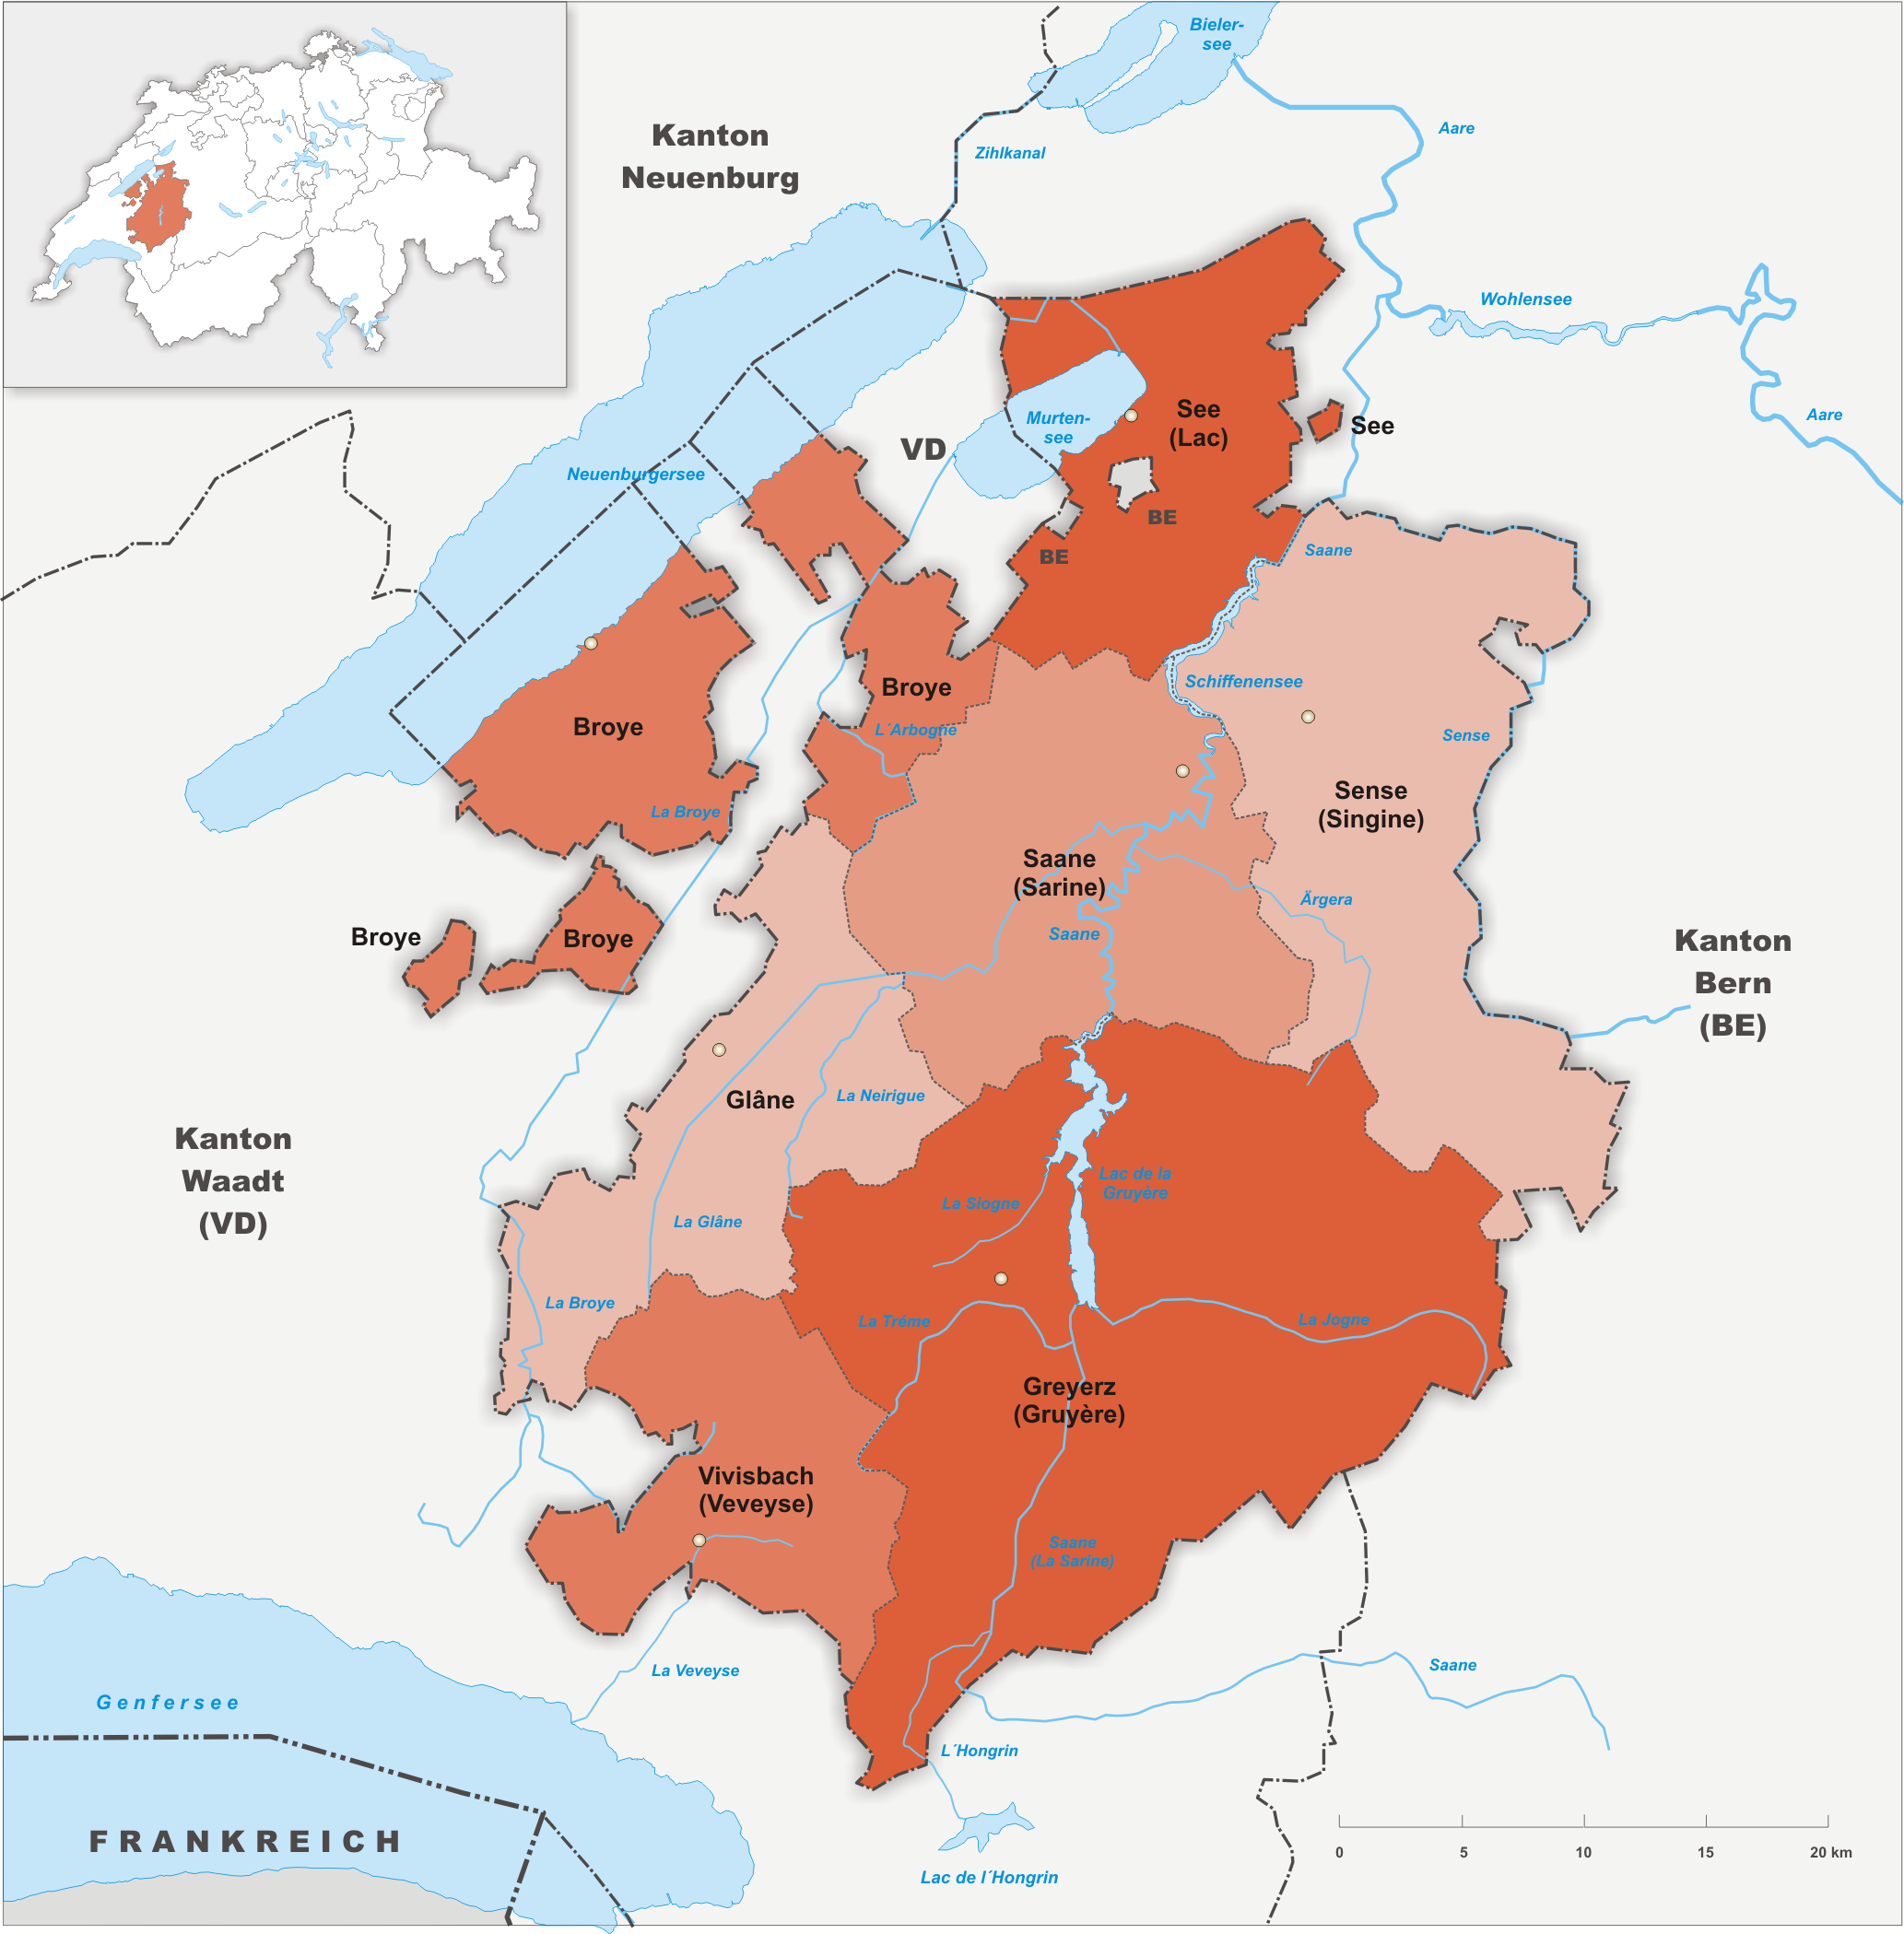 Bezirke des Kantons Freiburg